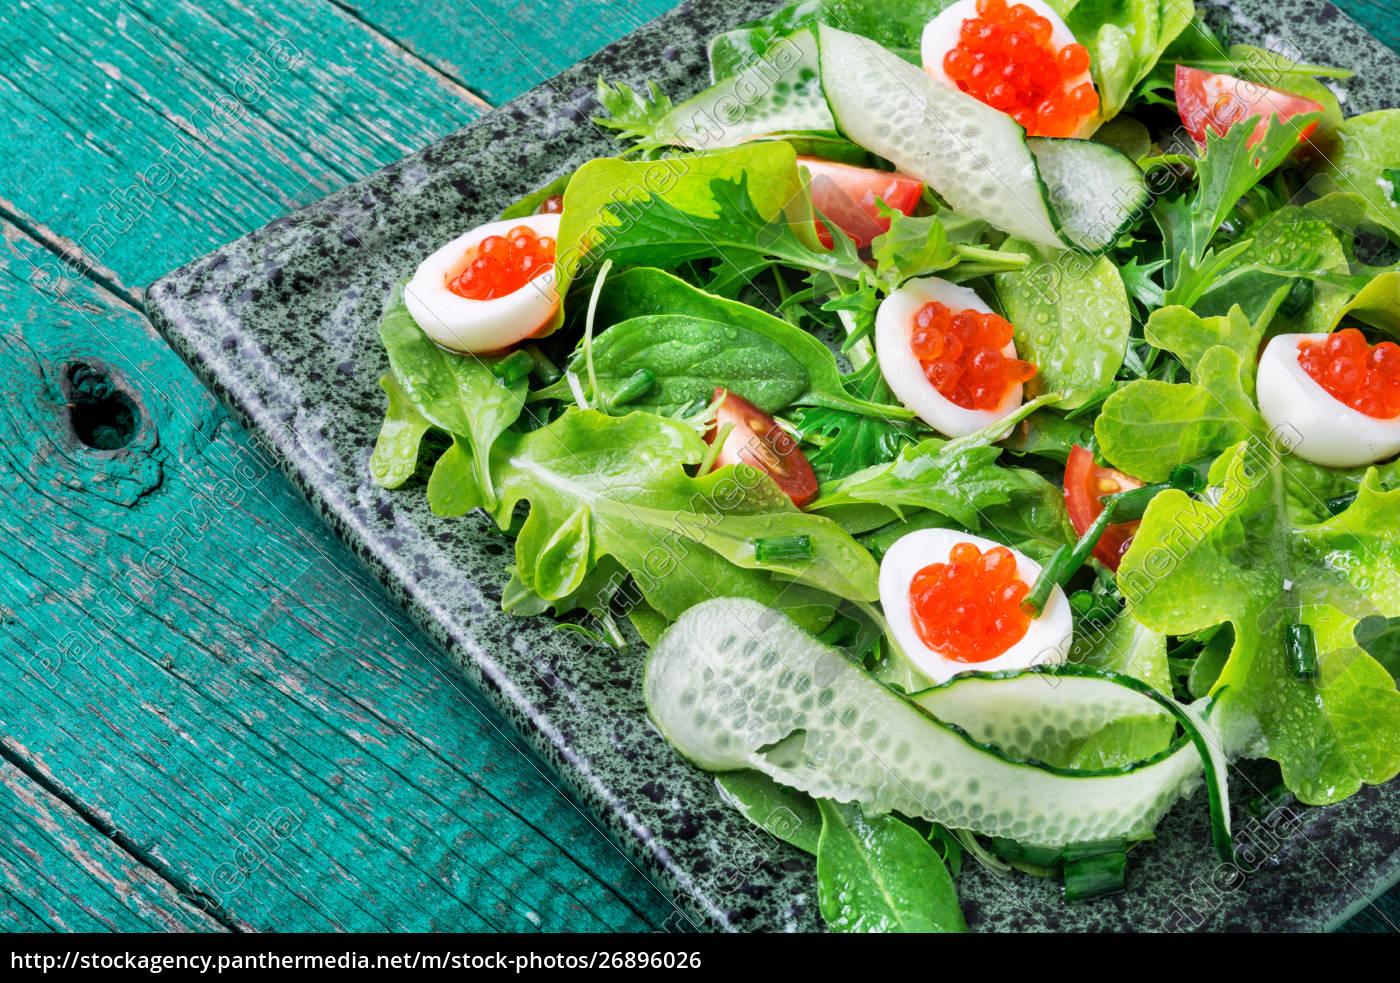 colorful, fresh, vegetable, salad - 26896026